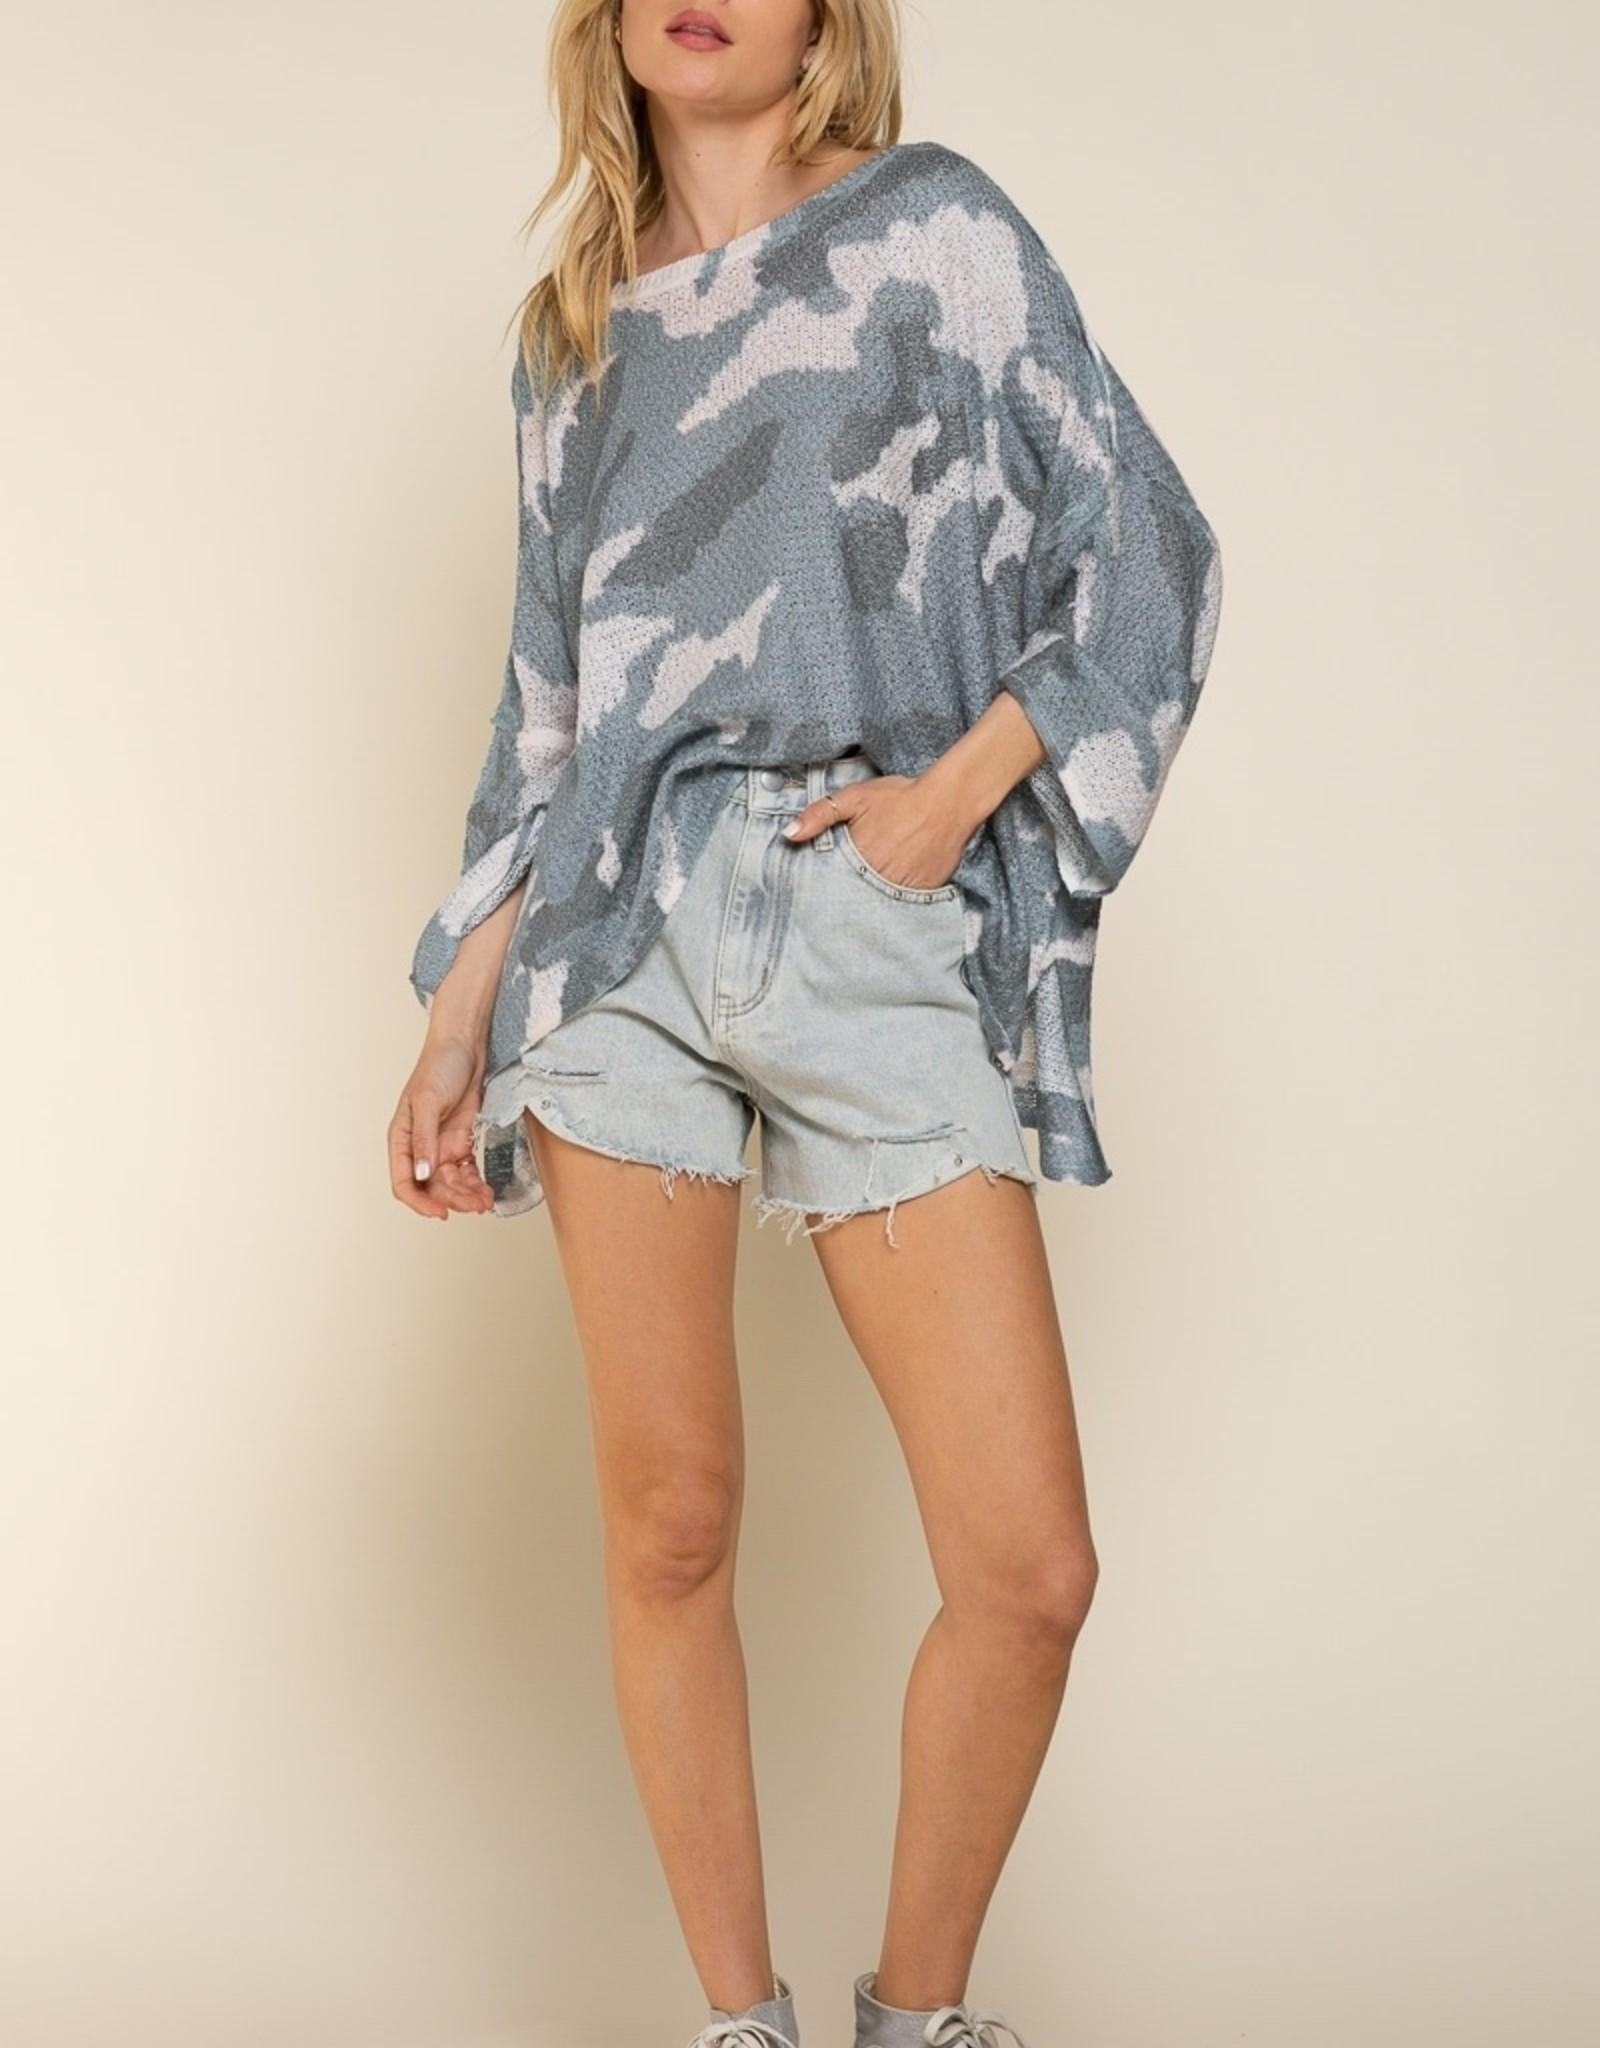 POL Clothing Lightweight Camo Sweater